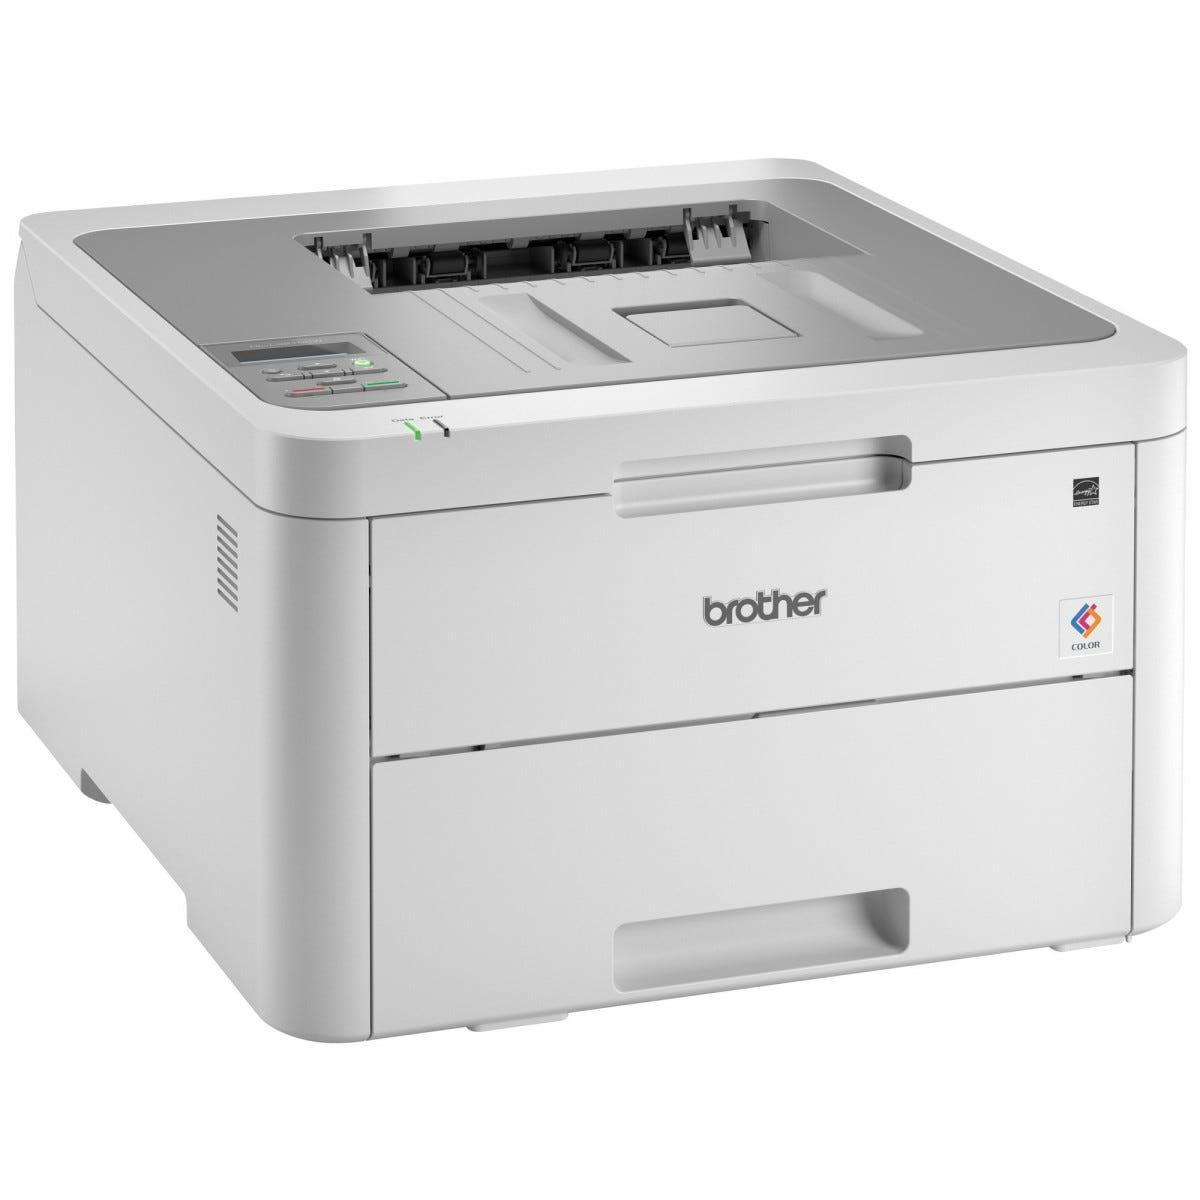 The Brother HL-L3210 printer